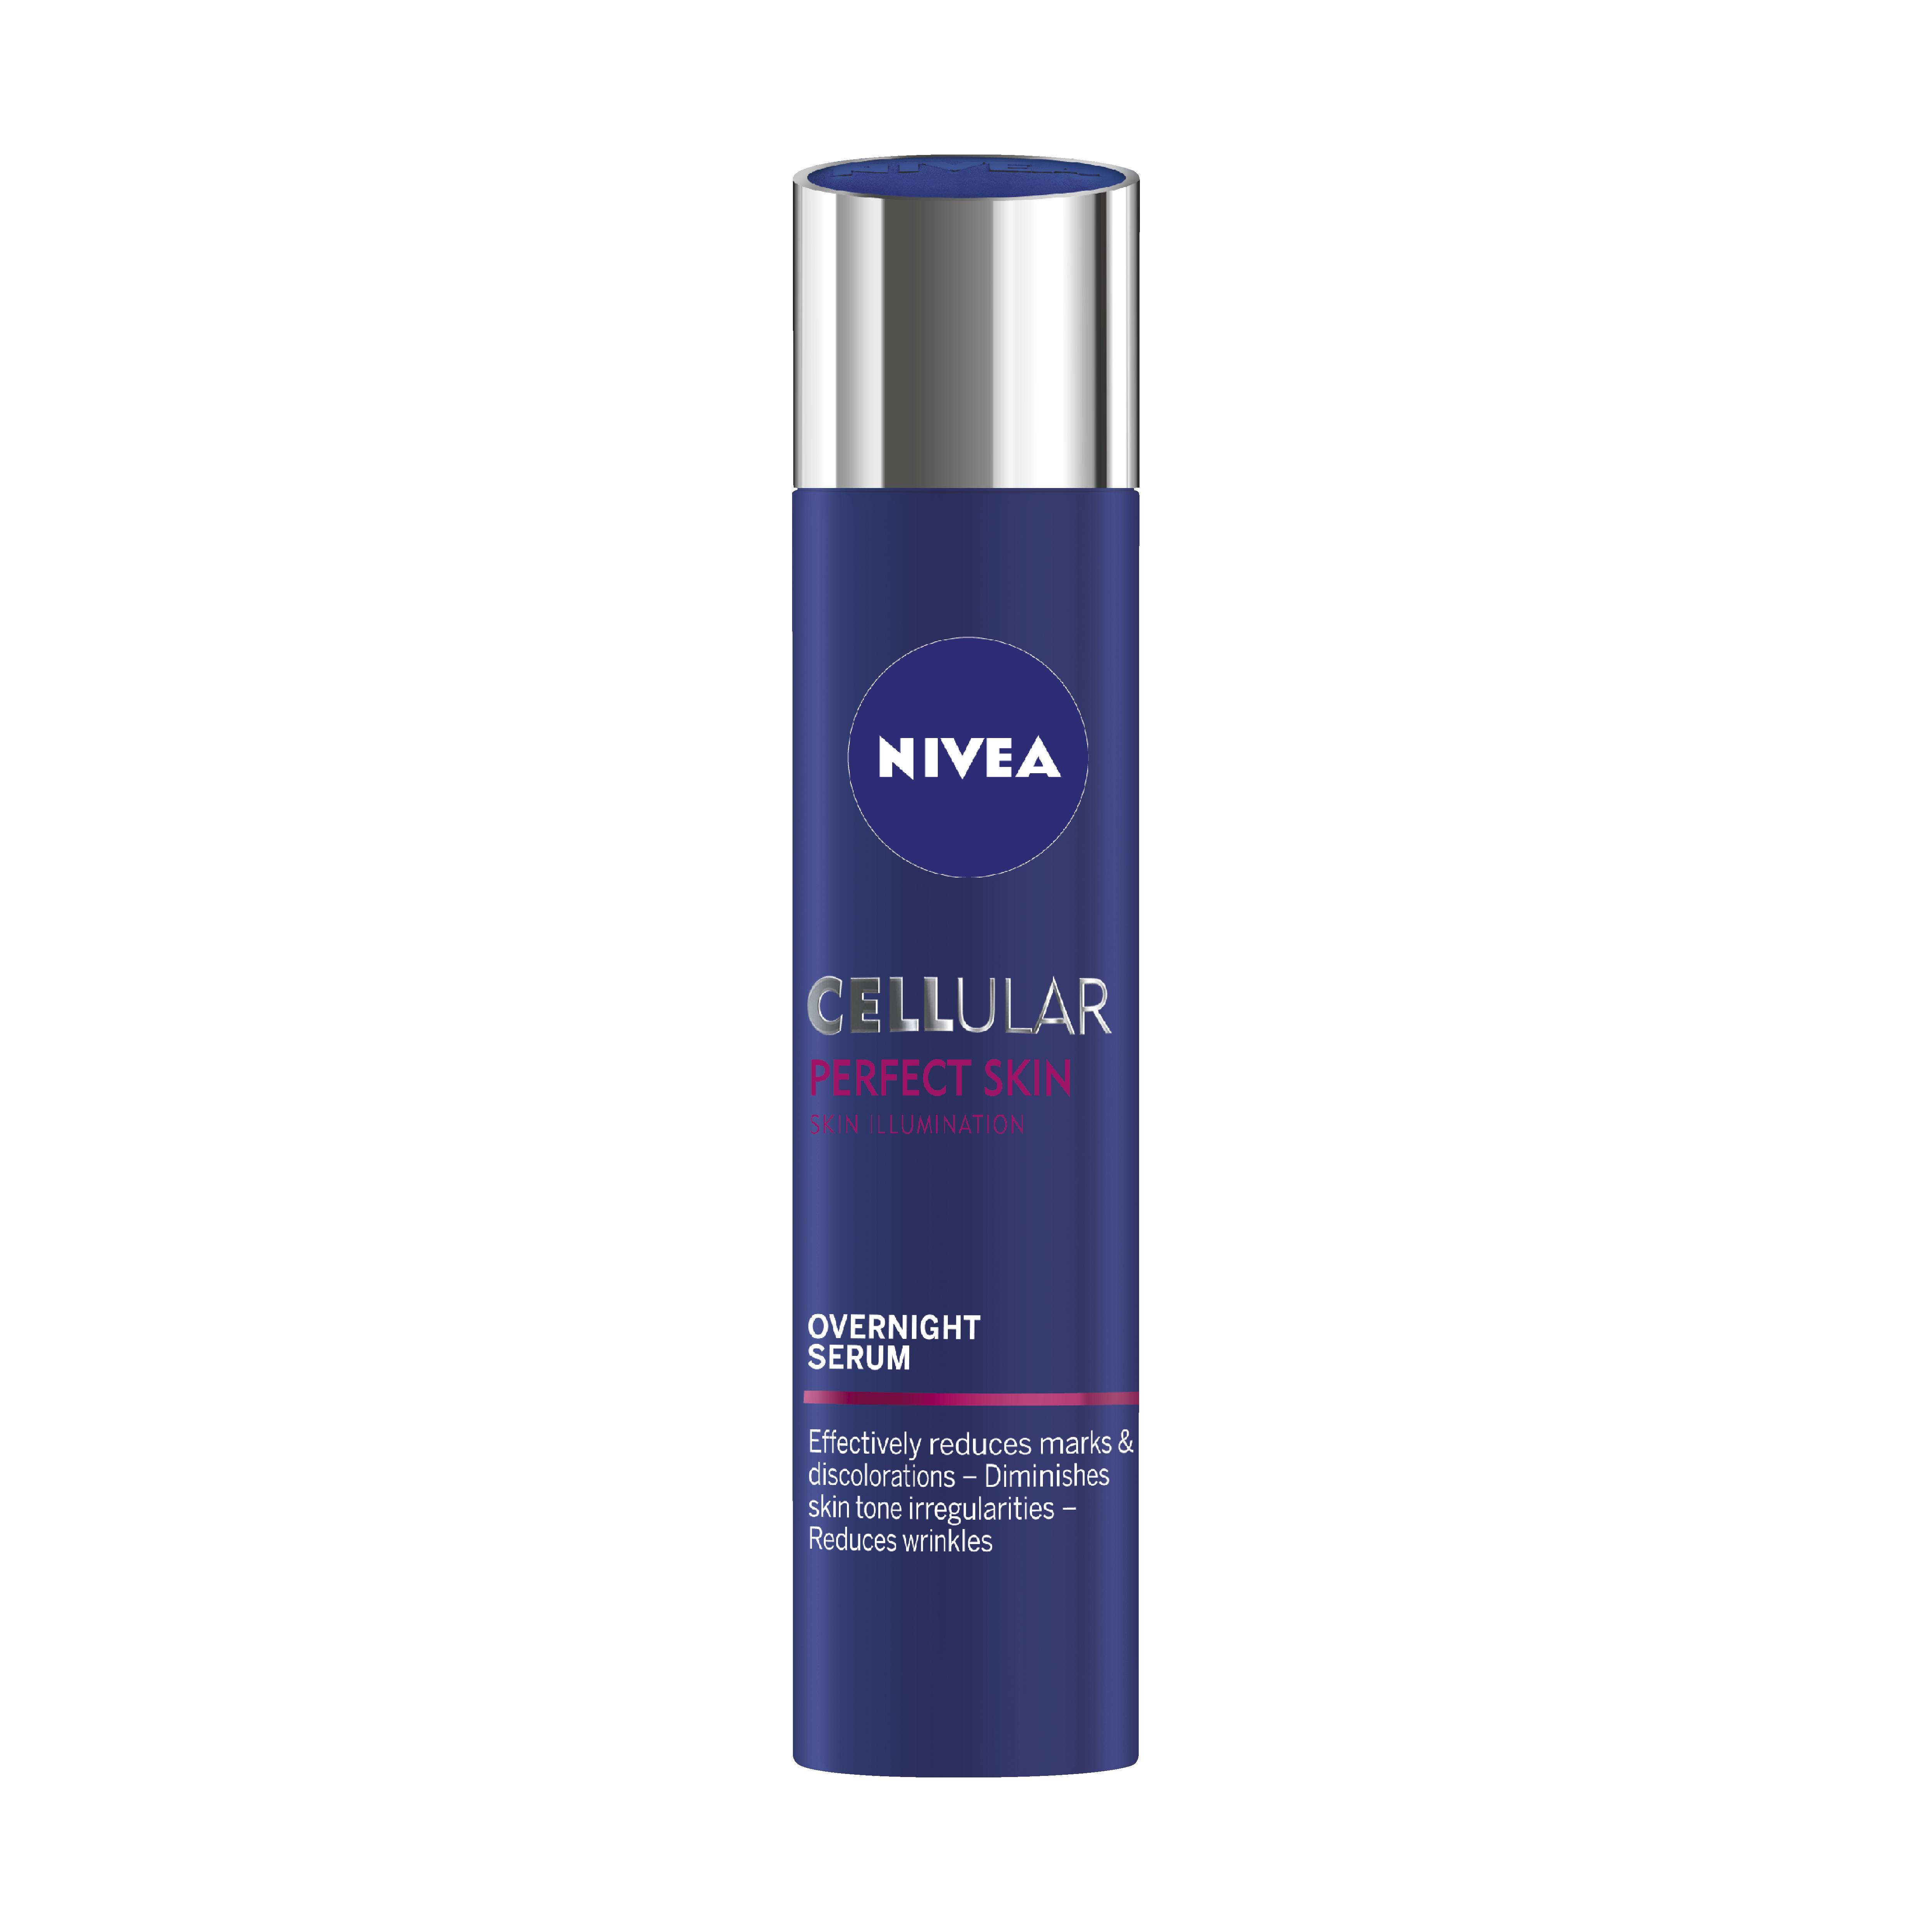 Cellular Perfect Skin Overnight Serum